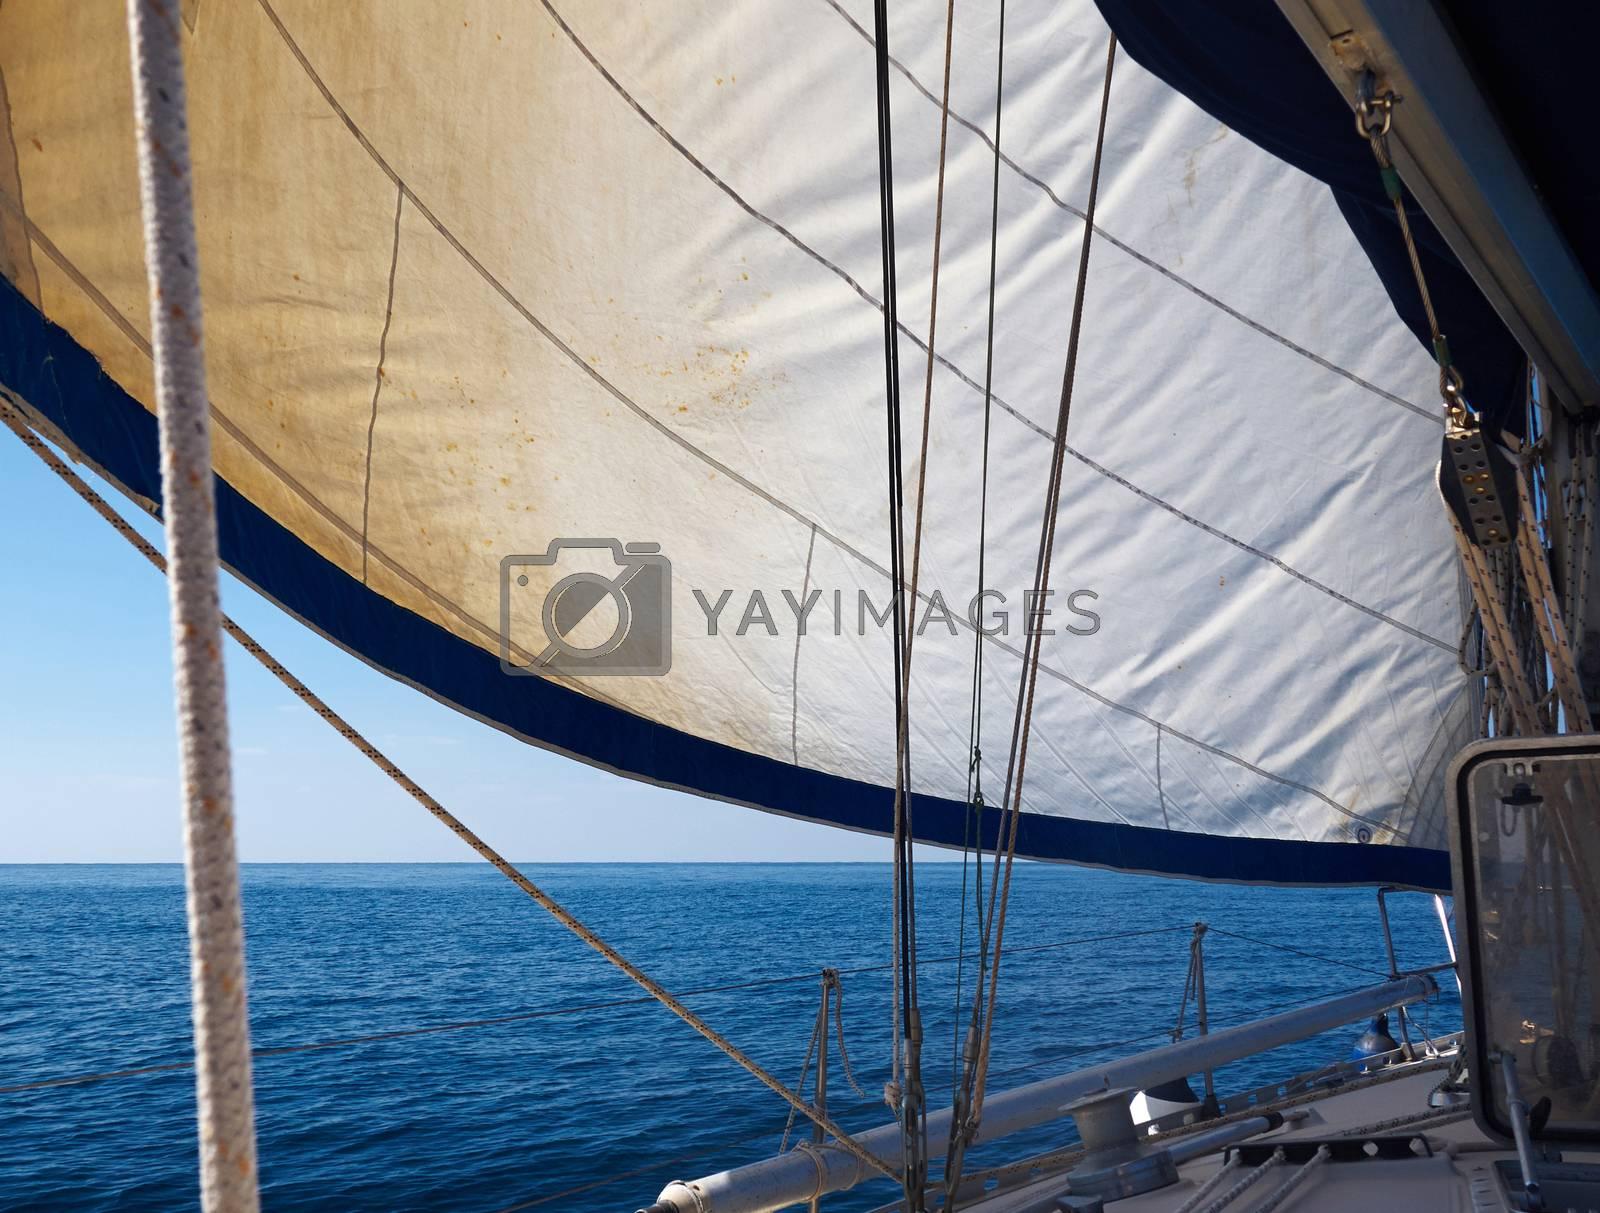 Yacht sailboat sailing Sailboat in the blue ocean great yachting vacation